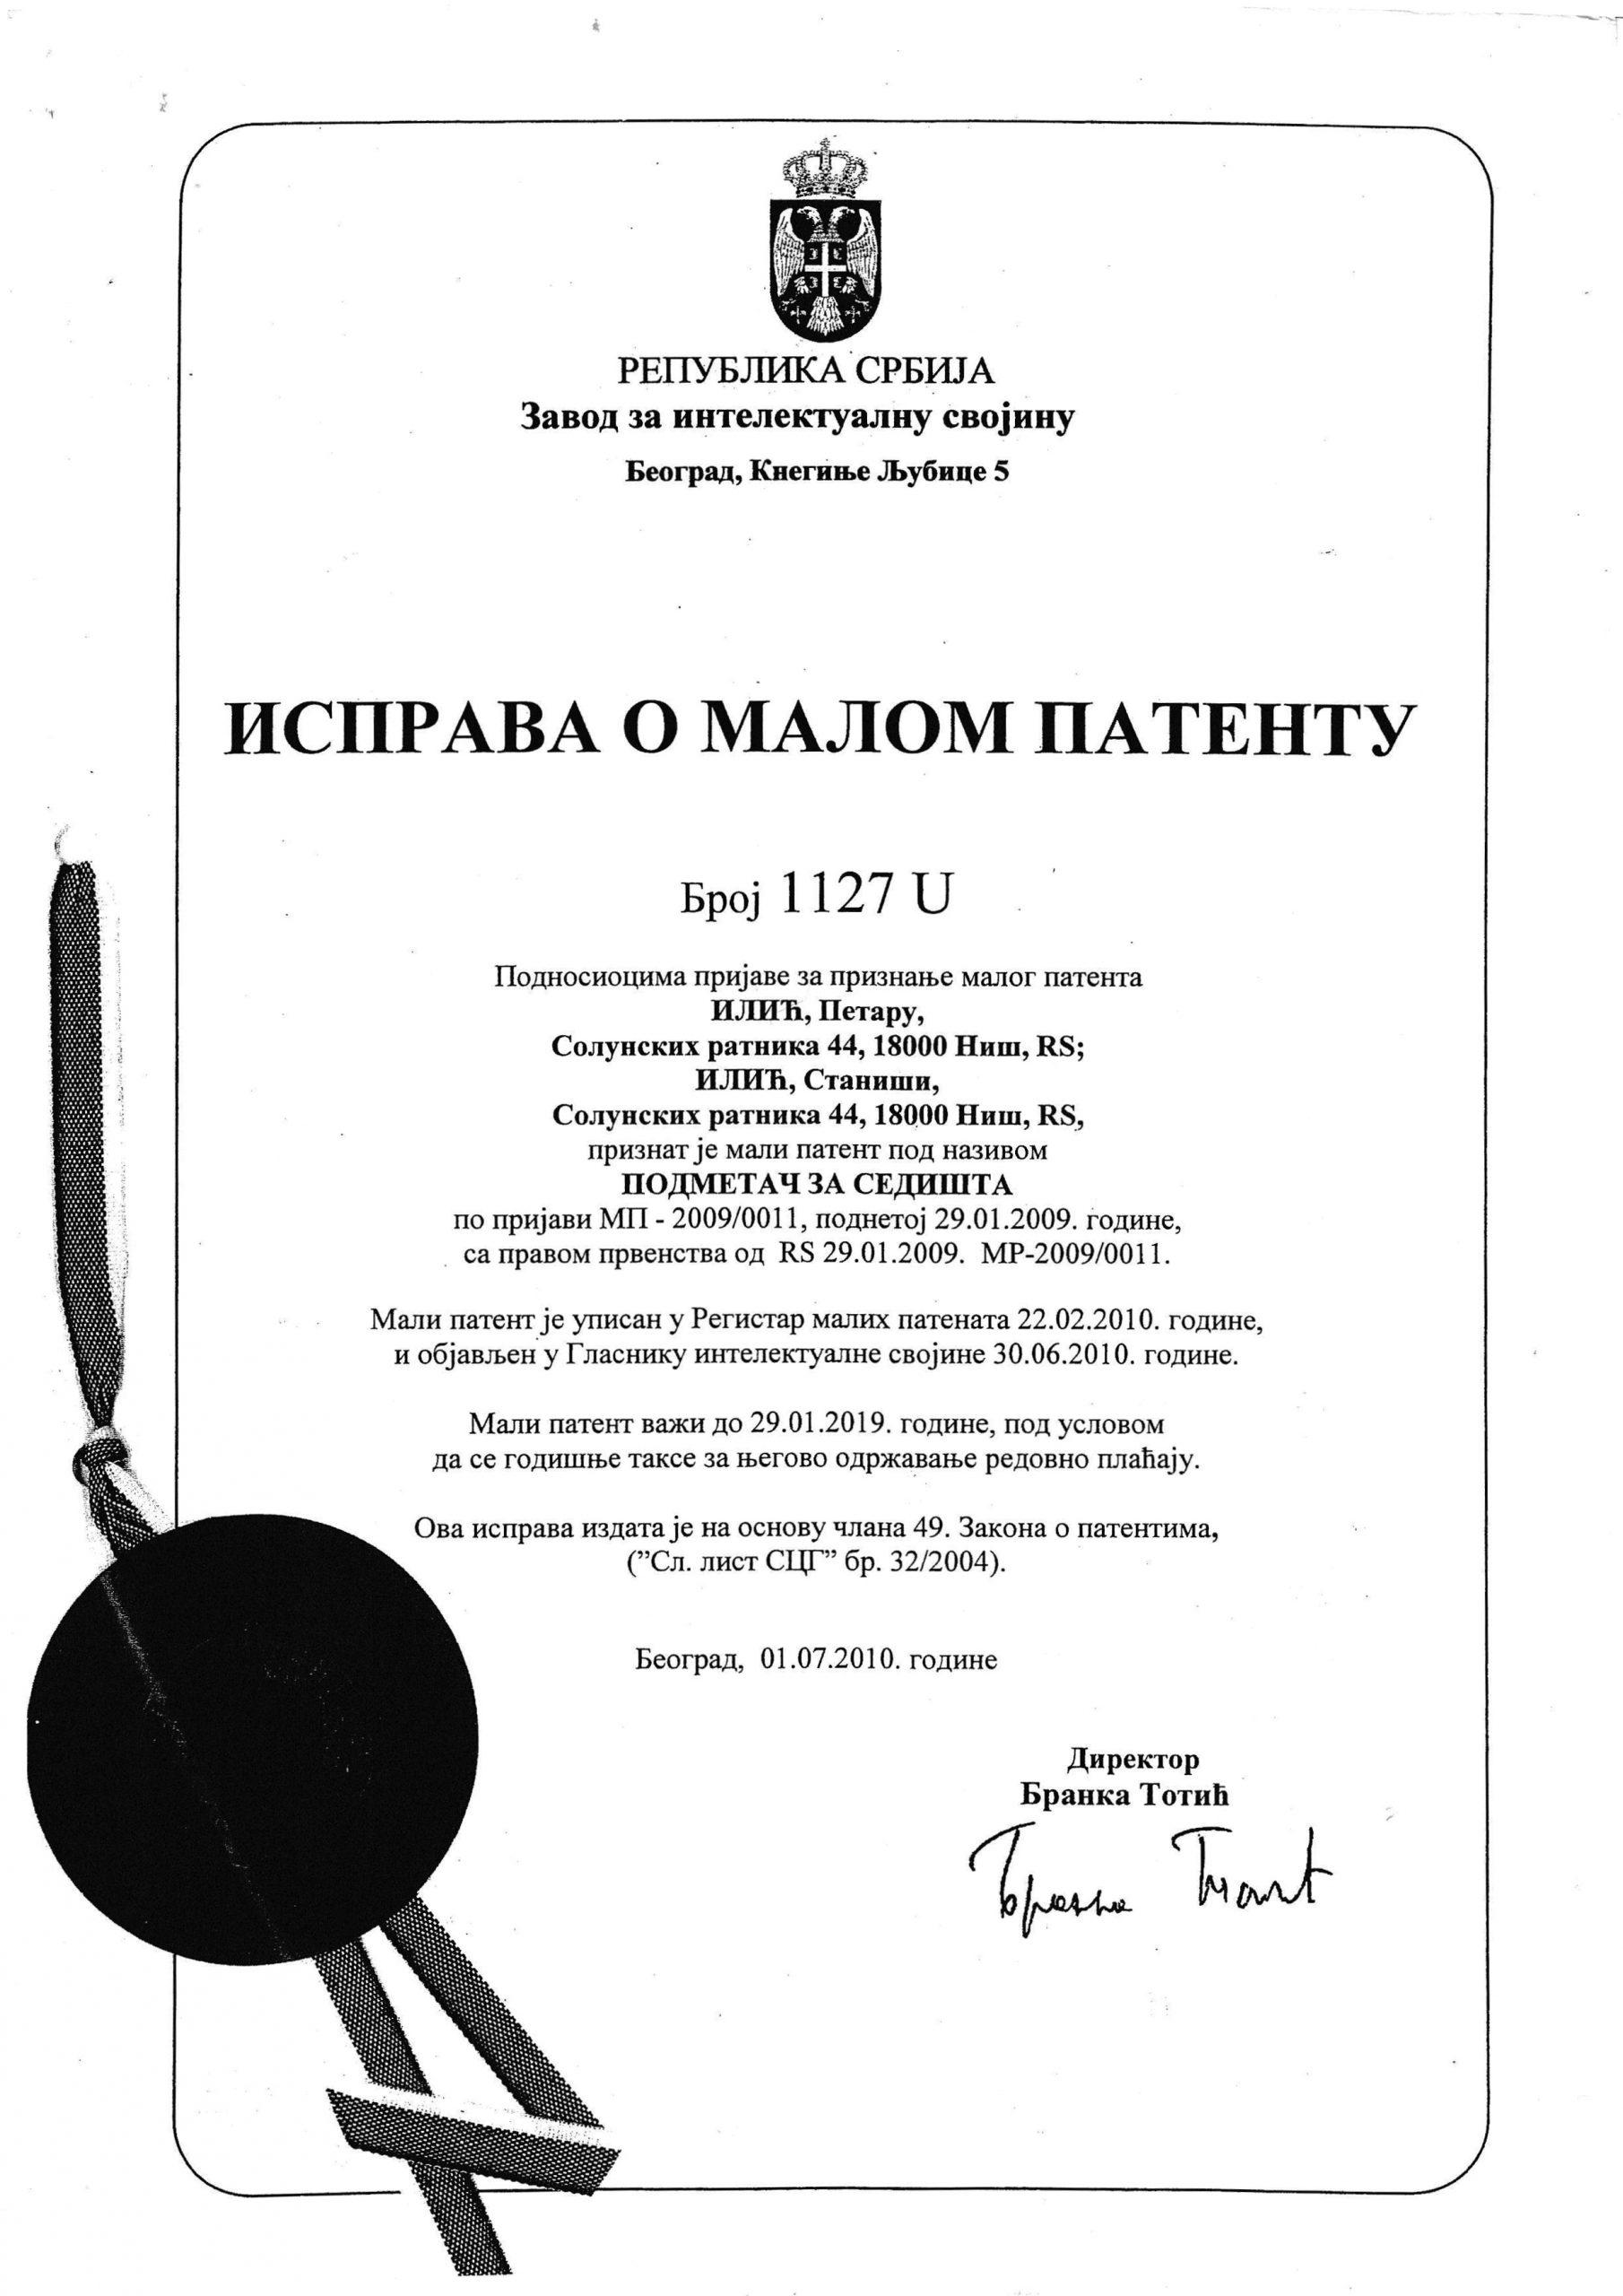 Corona Ergo patenti - podmetac za sedista 1